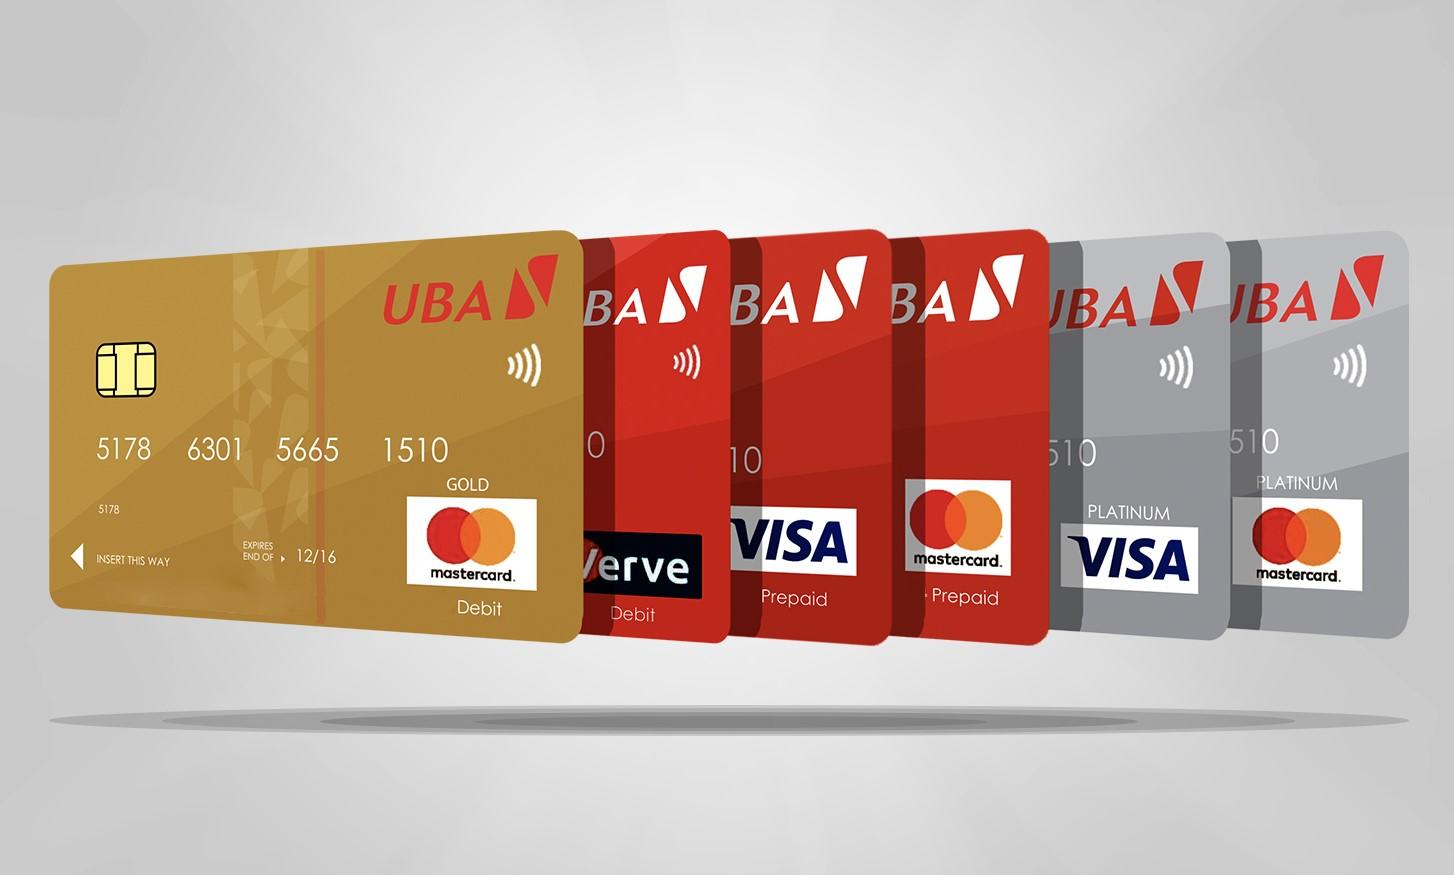 Carte Prepayee Uba.Carte Visa Prepayee Uba Cameroun Comment S En Procurer